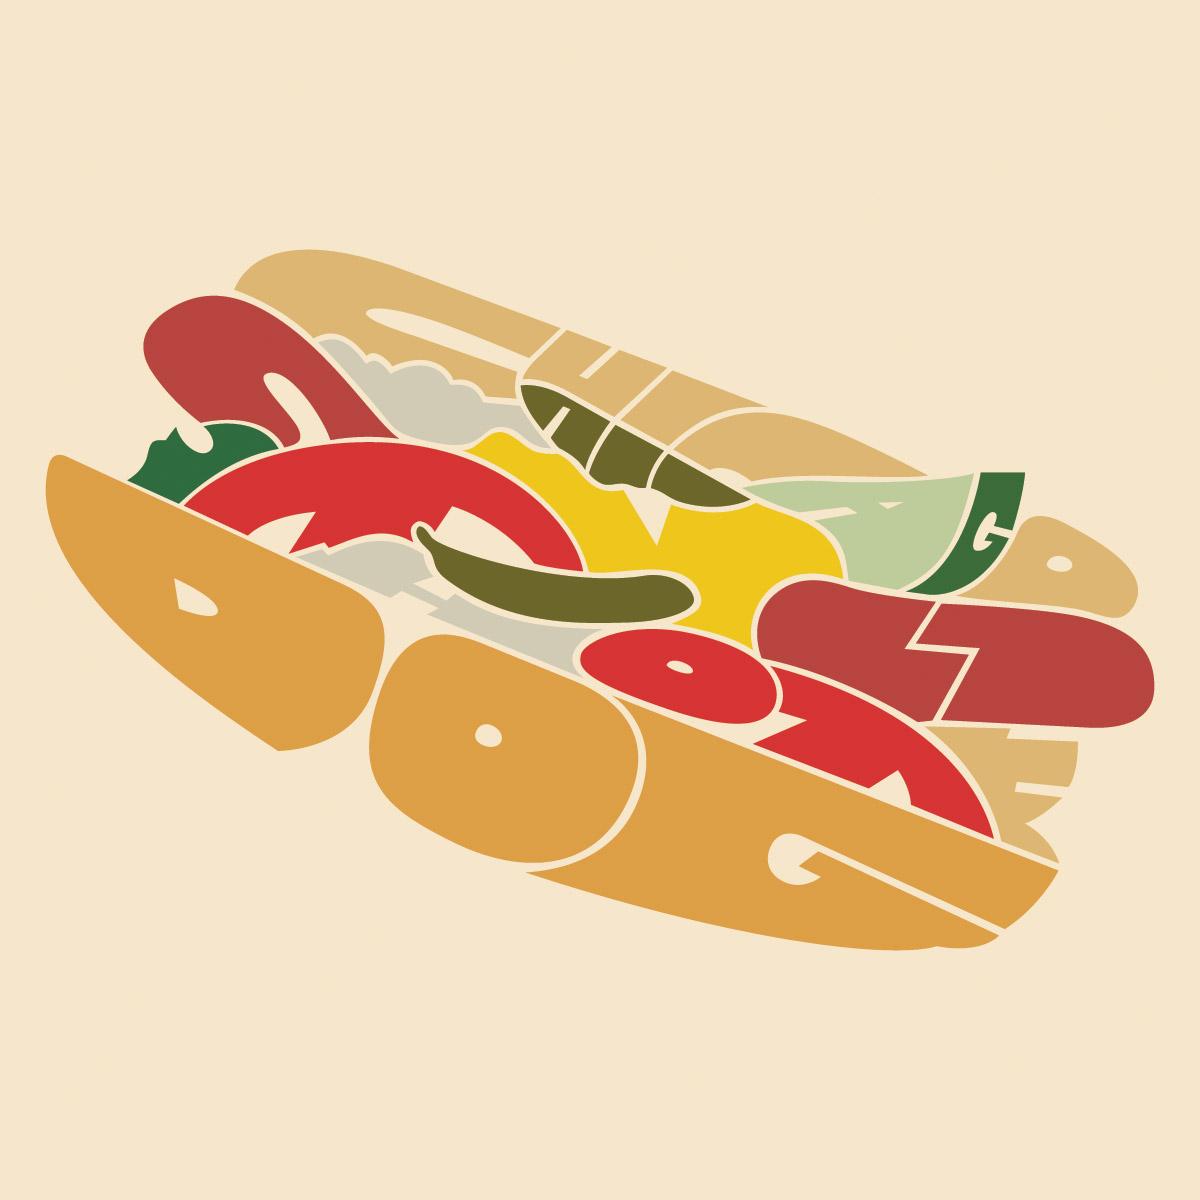 3-hot-dog.jpg